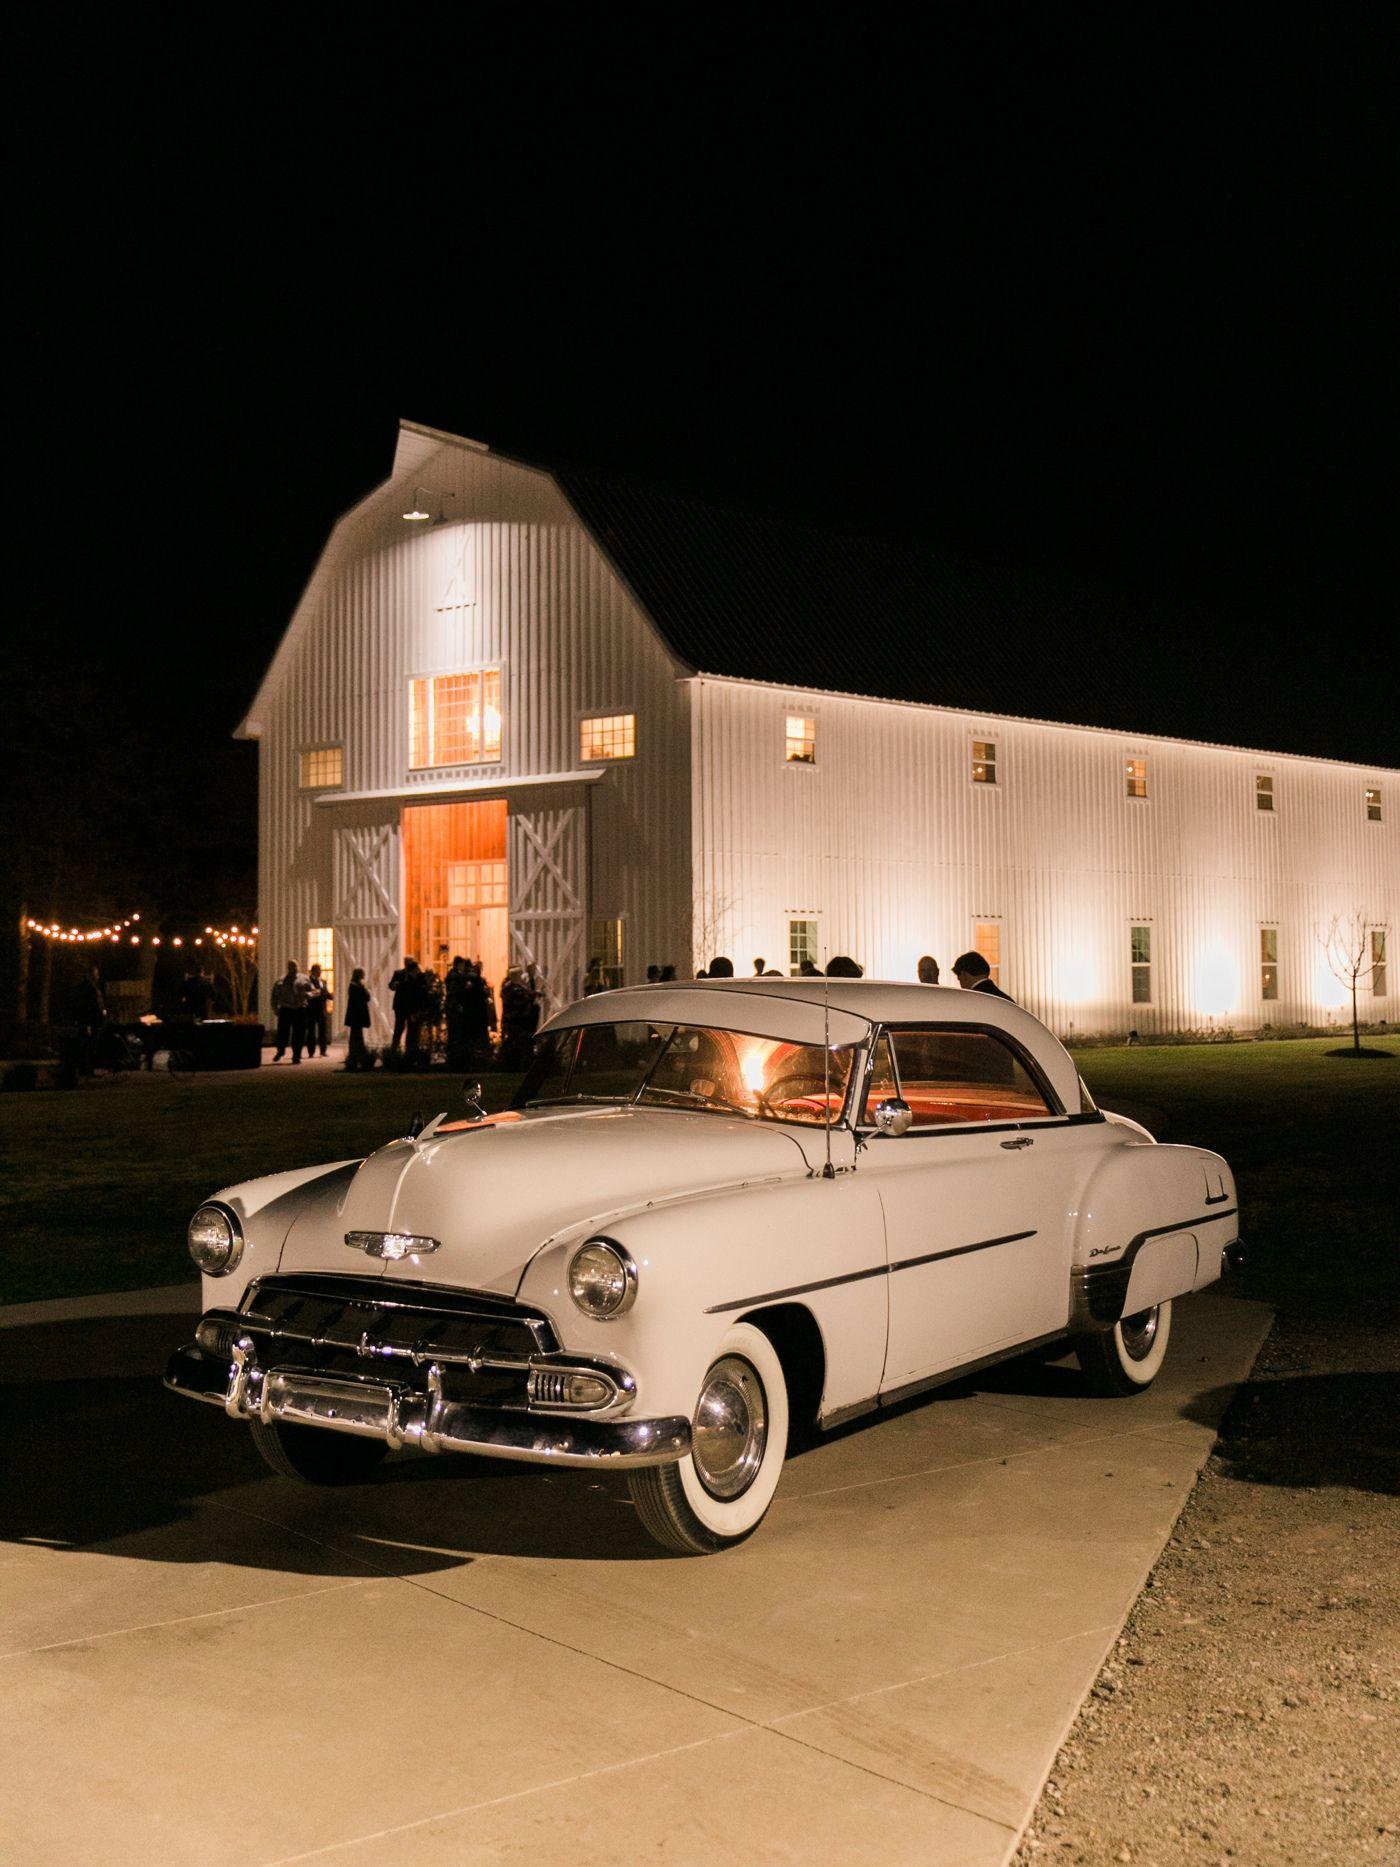 The White Sparrow wedding venue, white barn venue in Texas